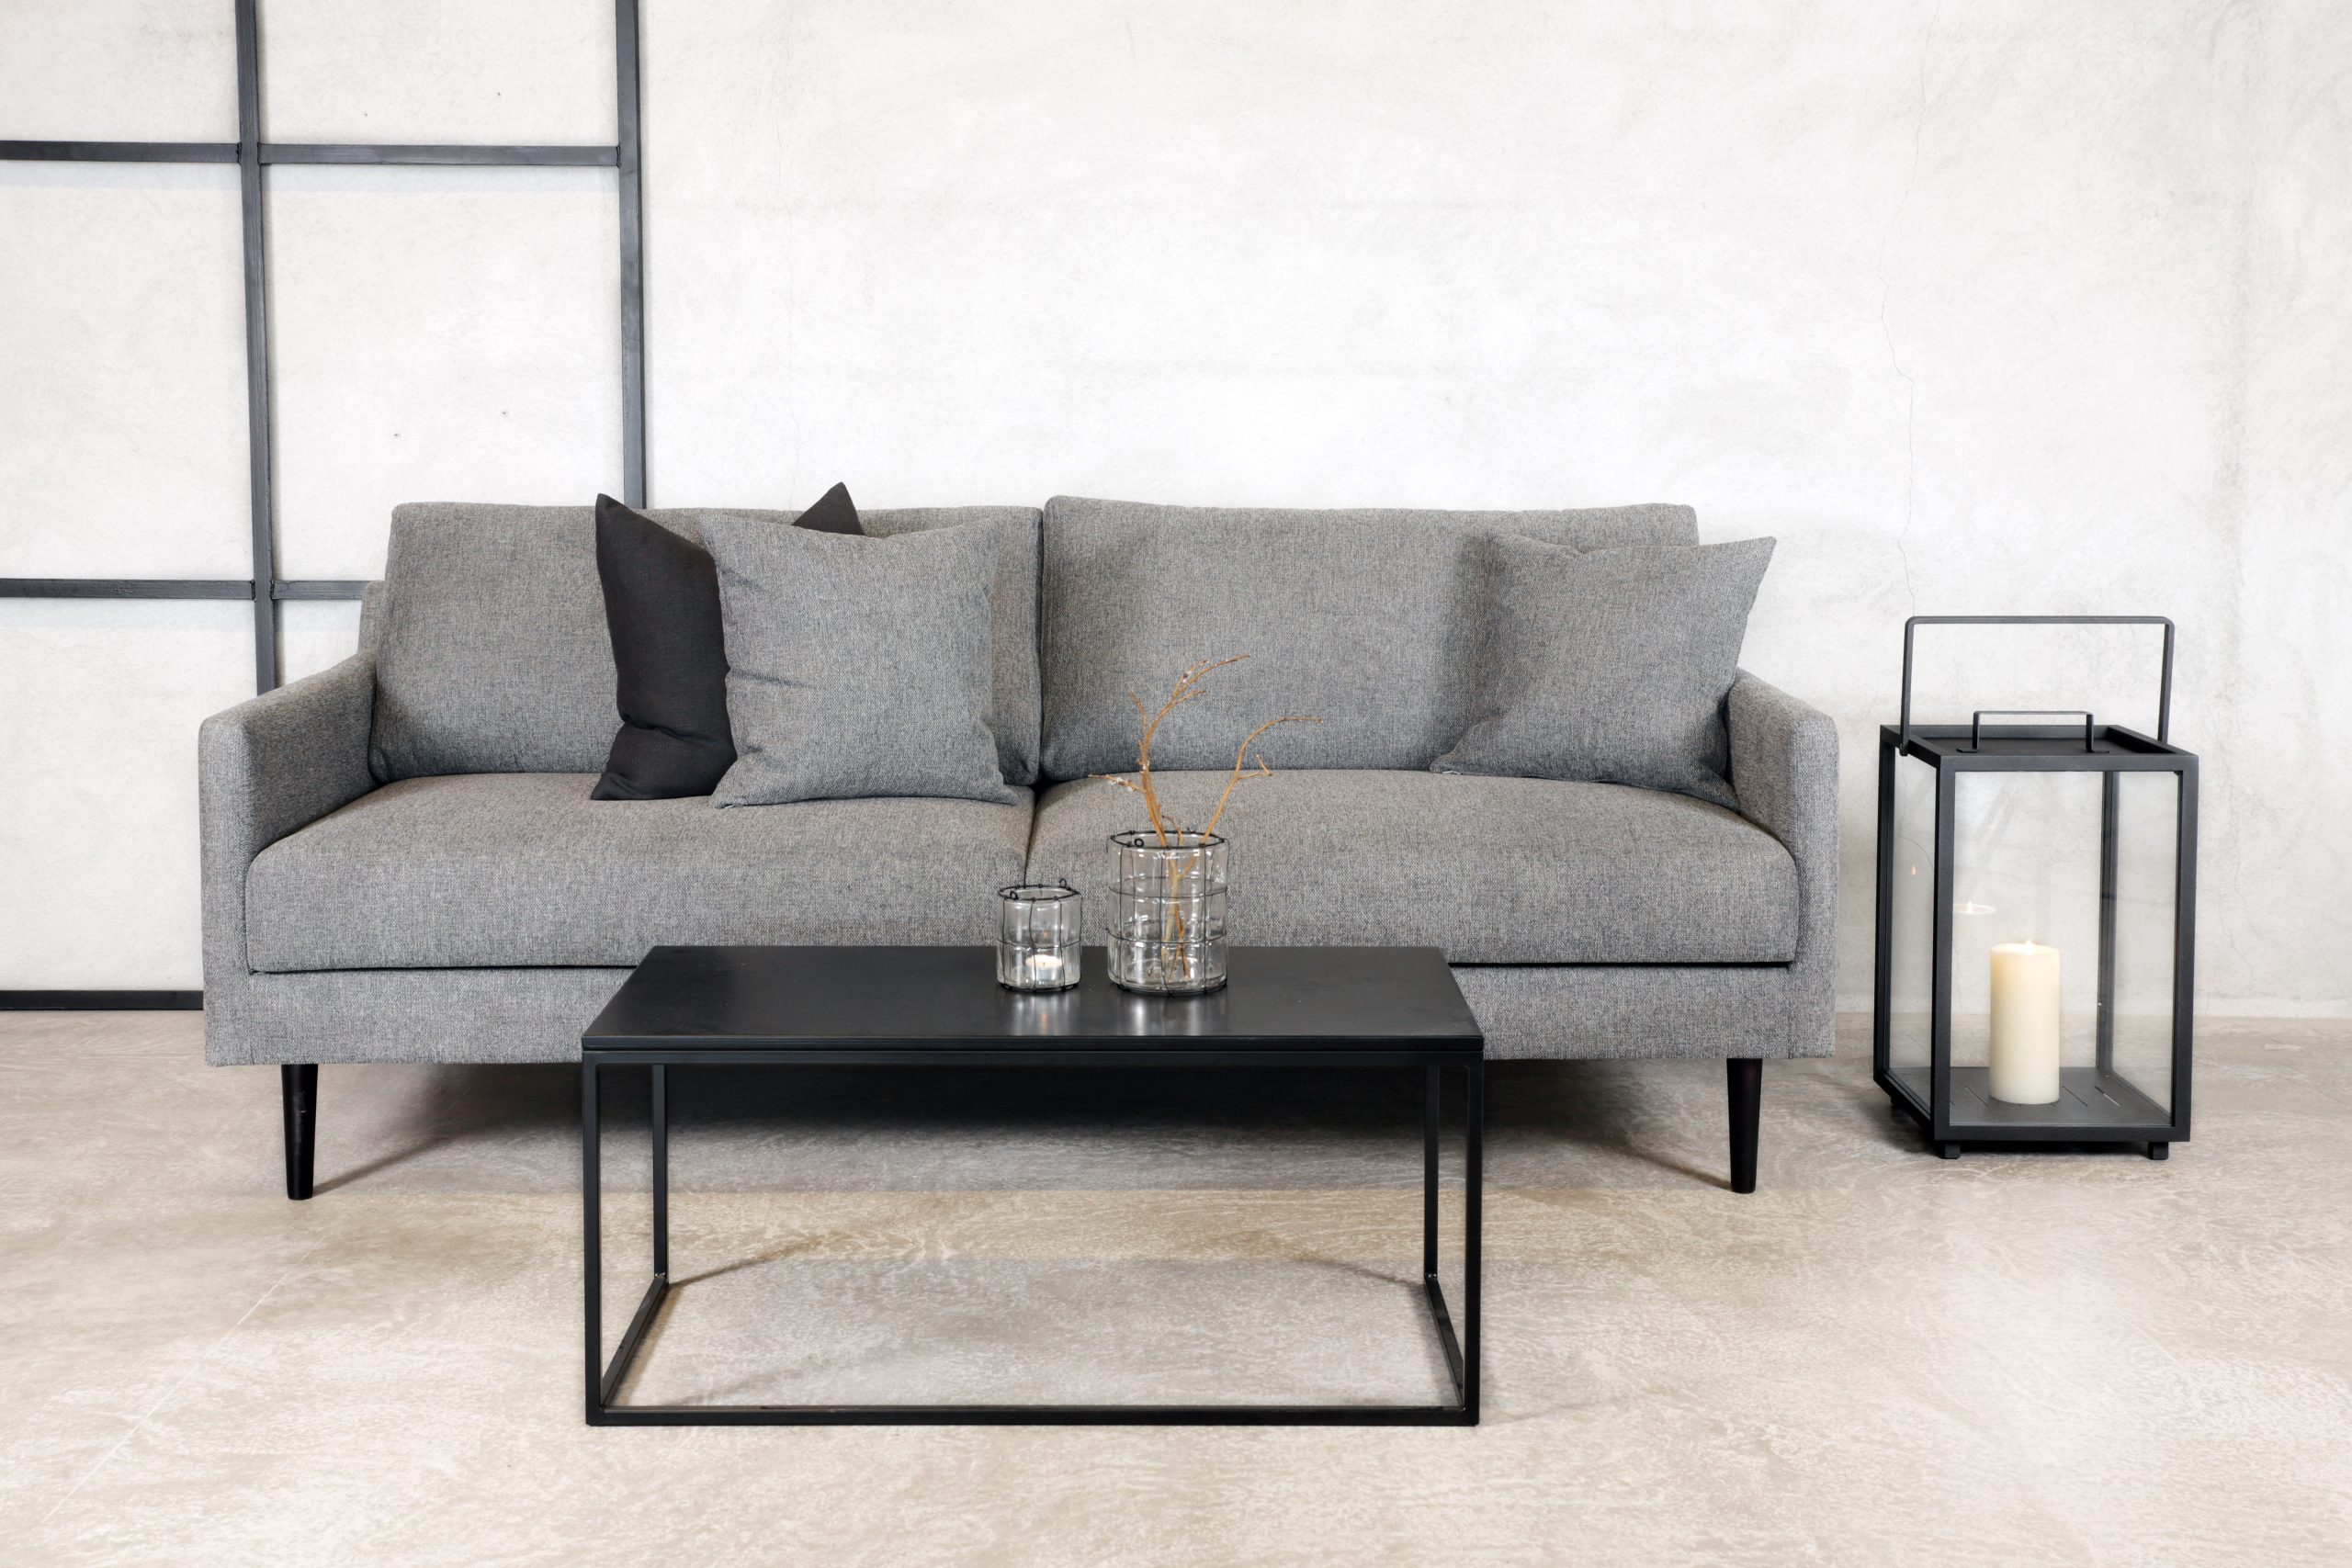 Nora sofa brego varmgrå sorte bein